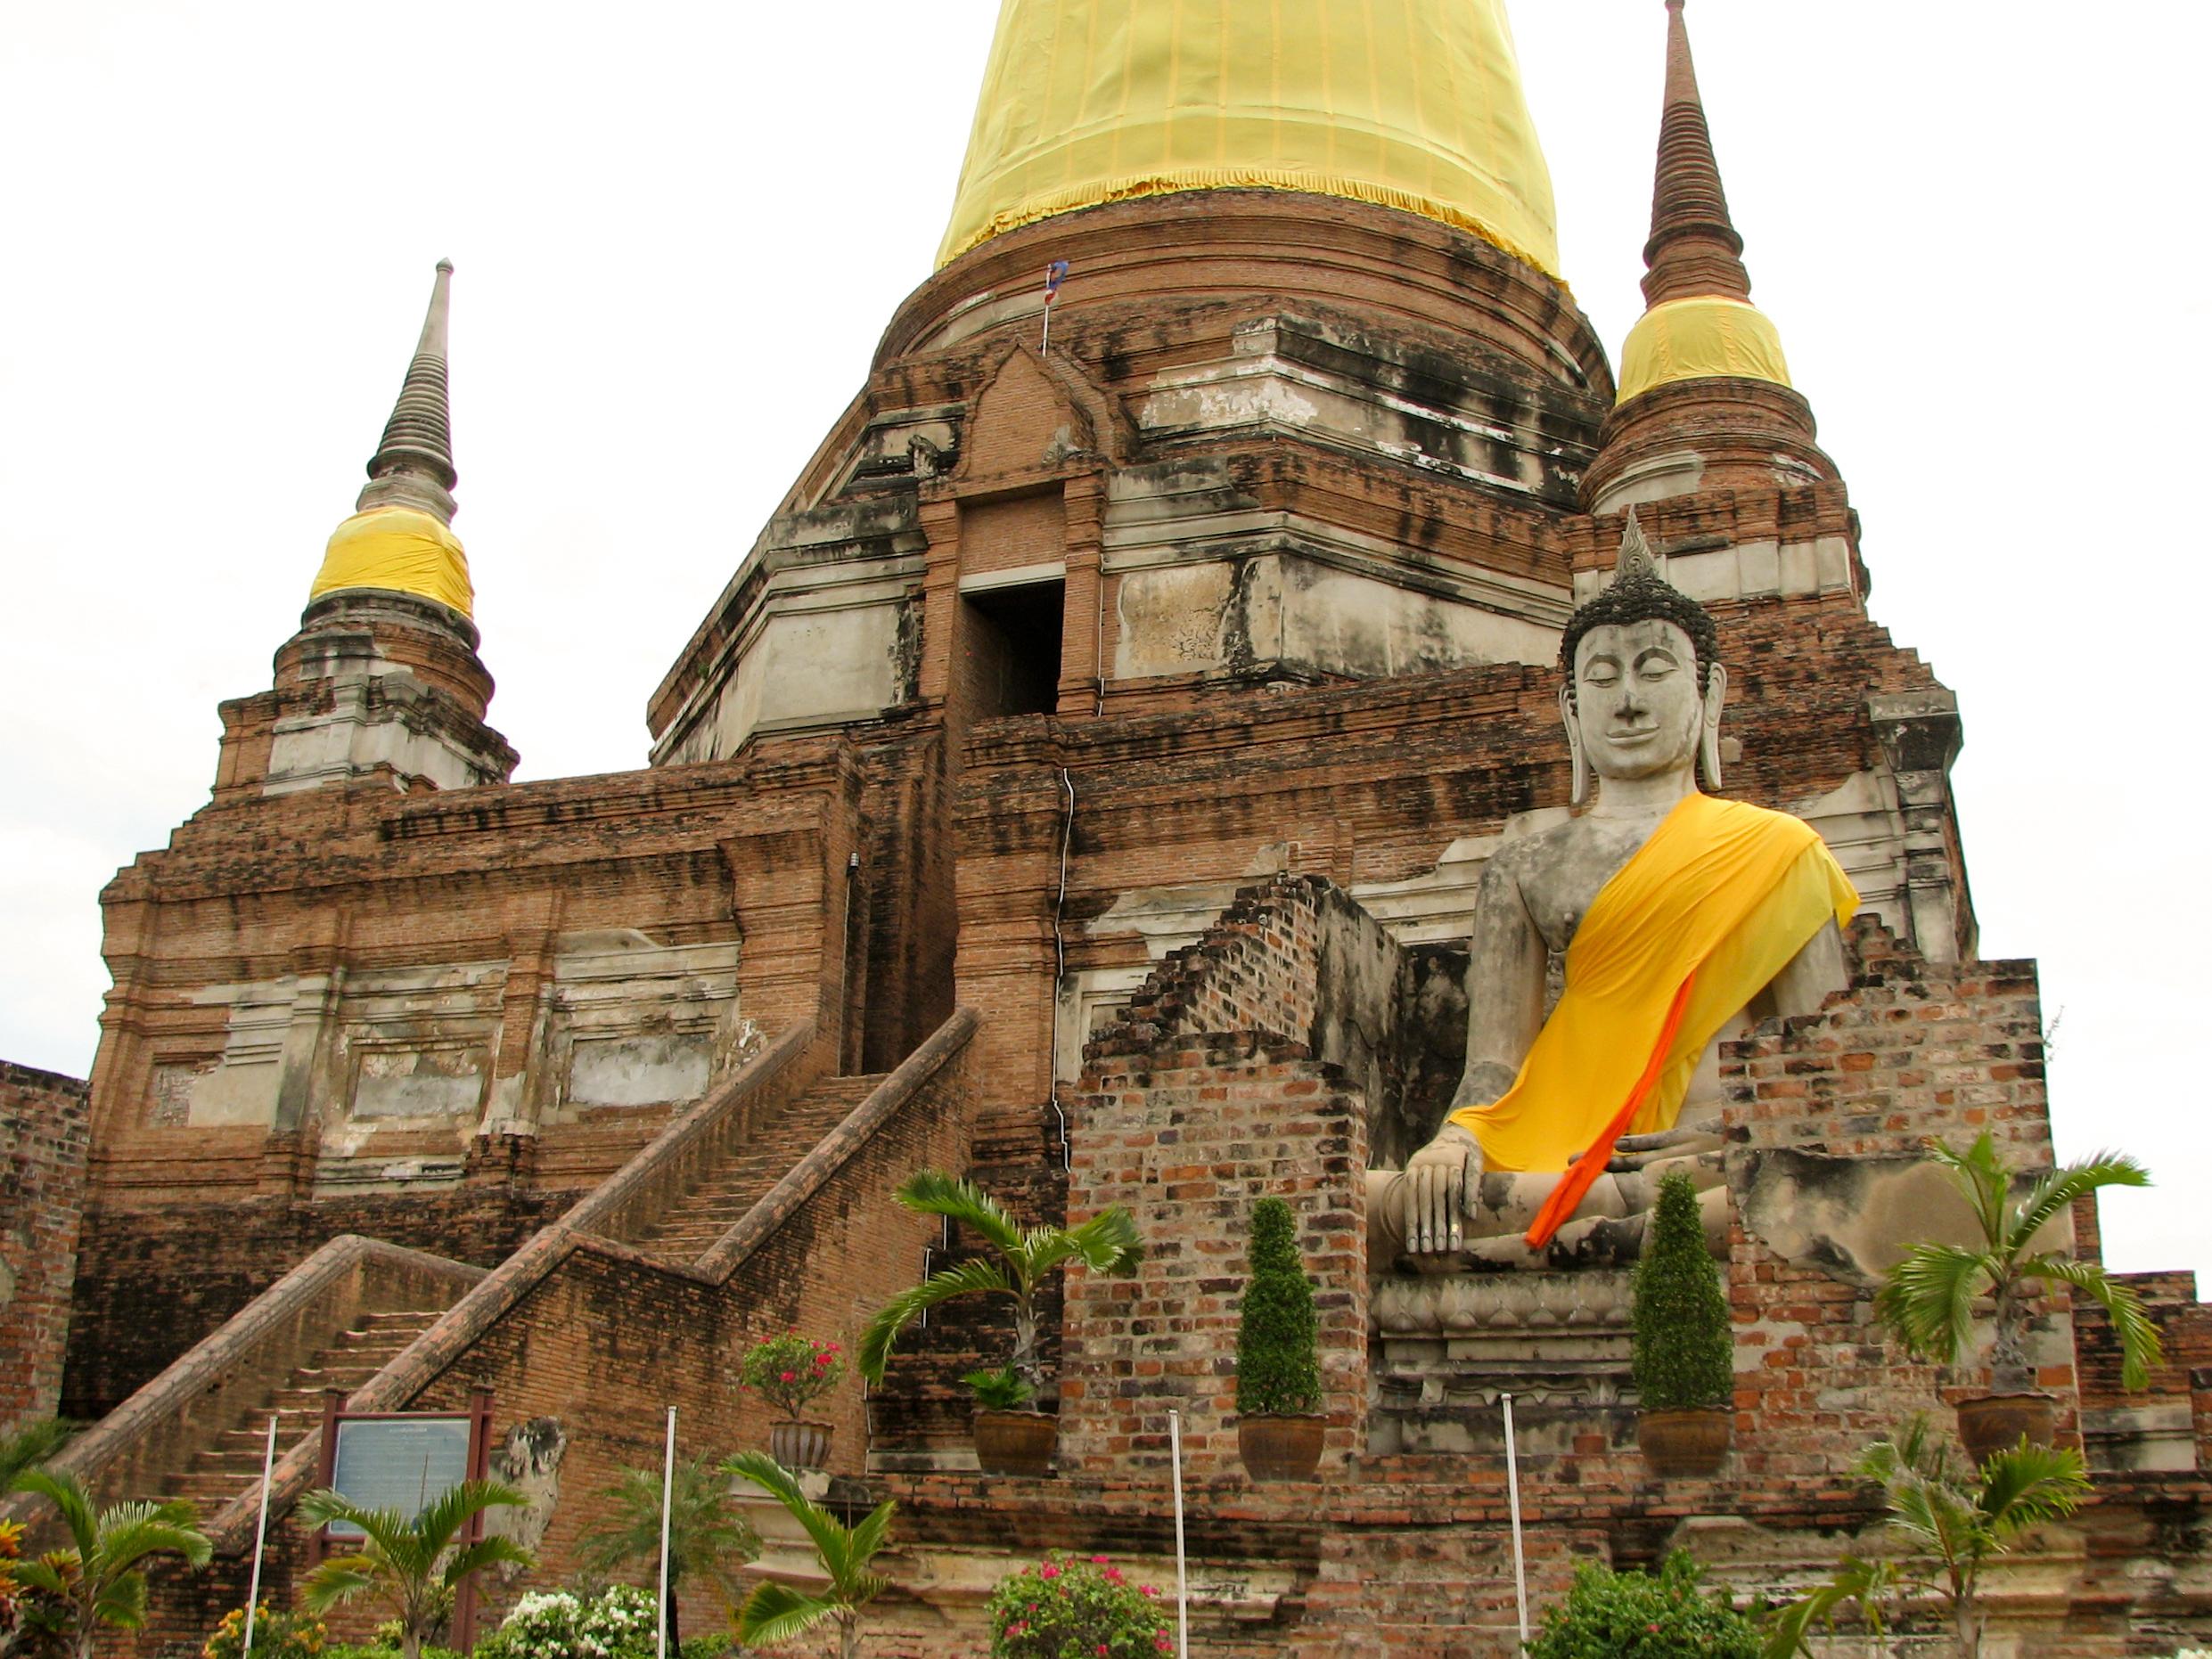 File:Wat Yai Chai Mongkhon Ayutthaya Thailand 02.jpg - Wikimedia Commons